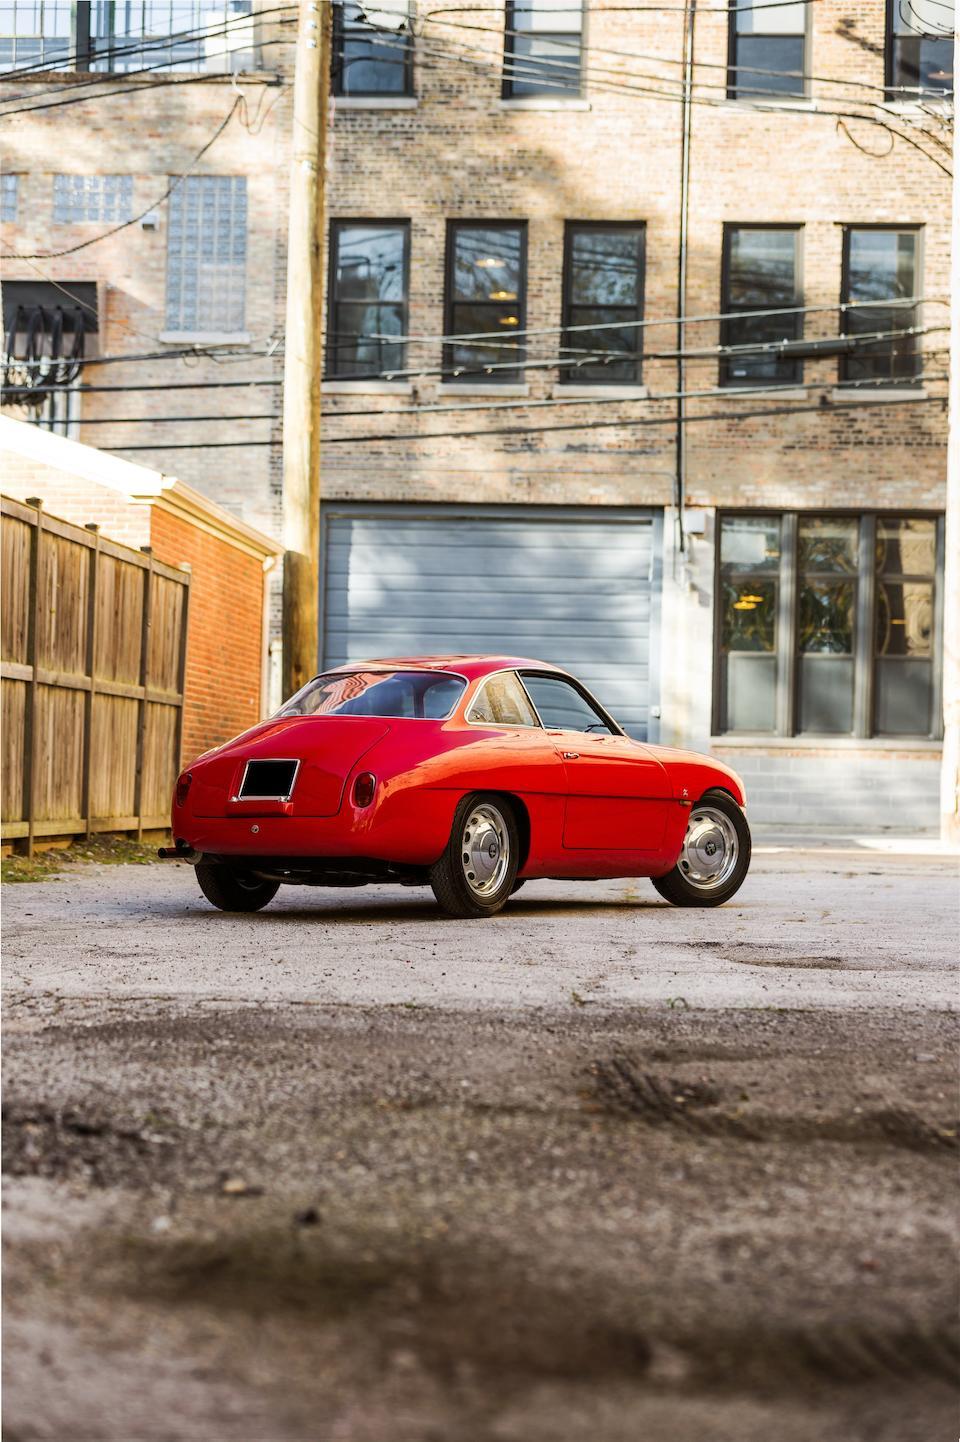 Historique de course extensive aux Etats-Unis,Alfa Romeo Giulietta SZ berlinette coda ronda 1961